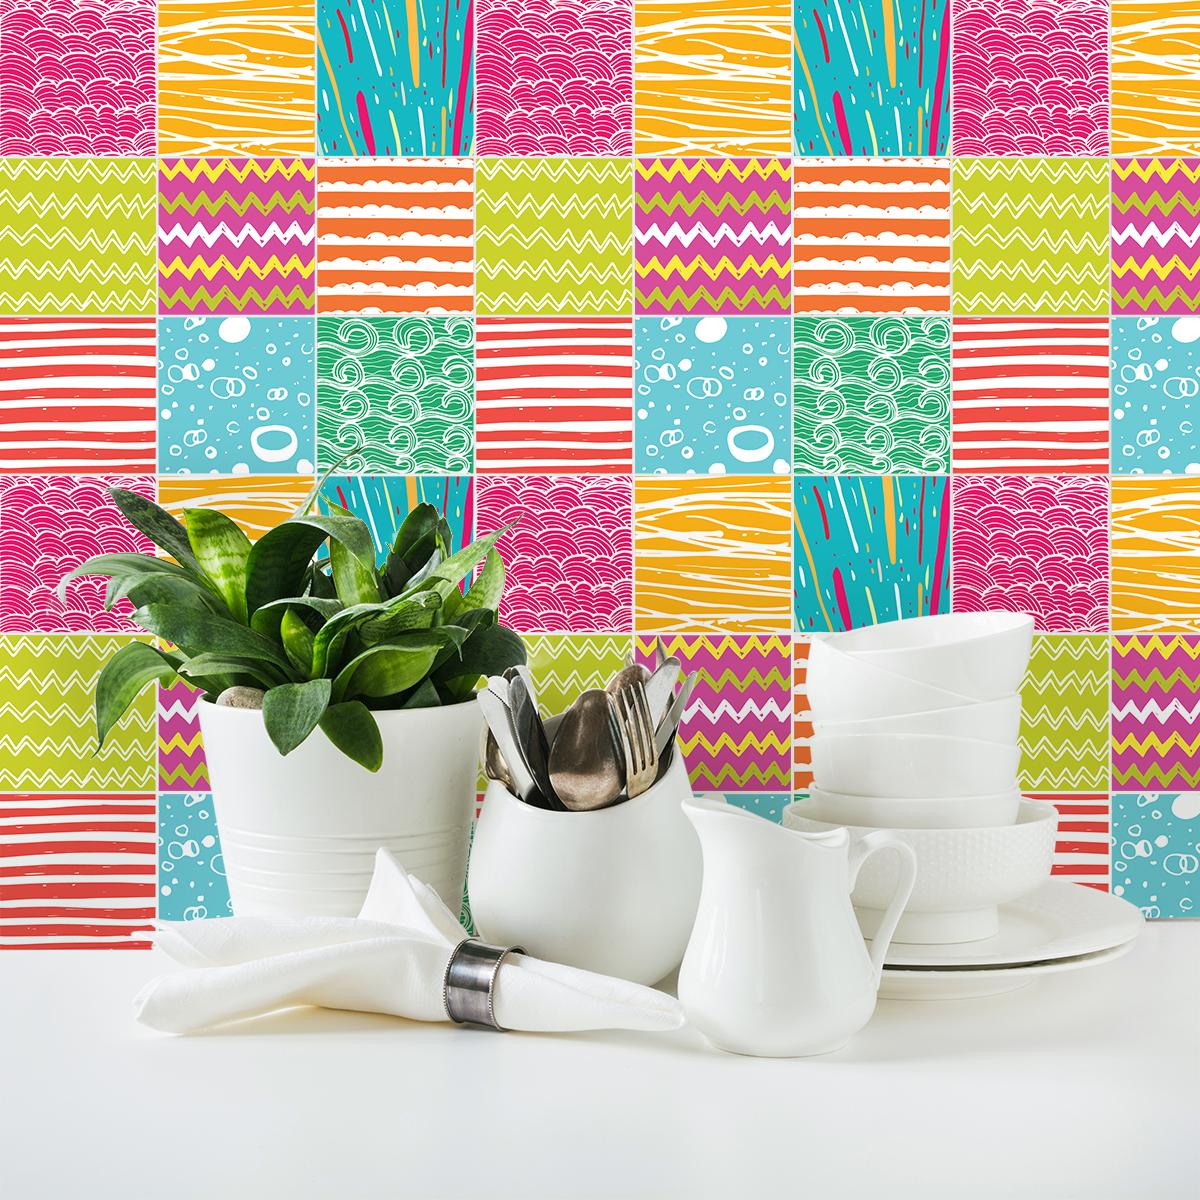 9 stickers carreaux de ciment azulejos begona cuisine. Black Bedroom Furniture Sets. Home Design Ideas